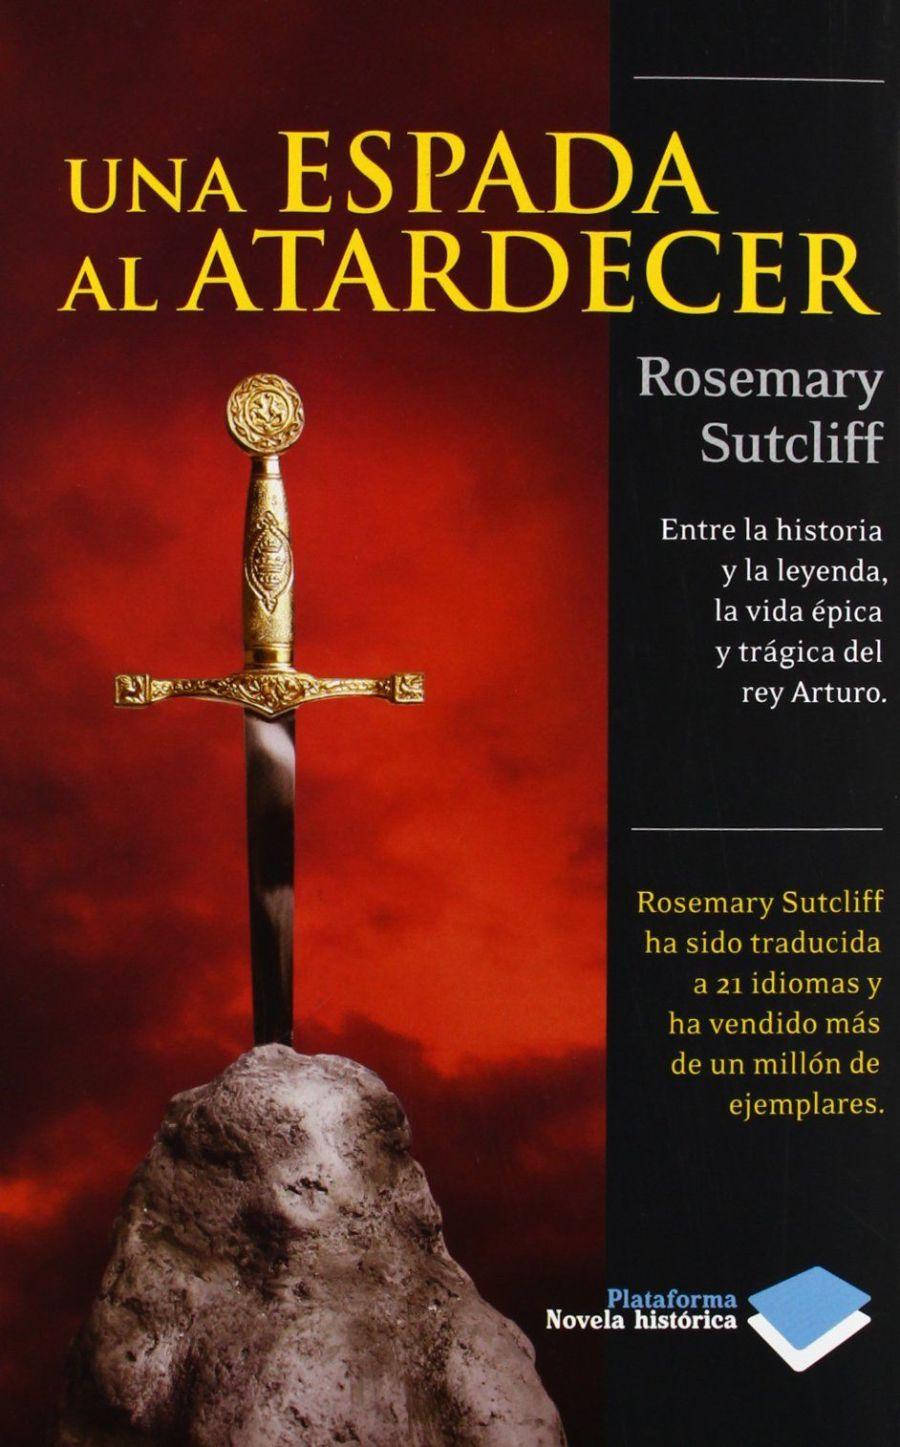 Una espada al atardecer Book Cover